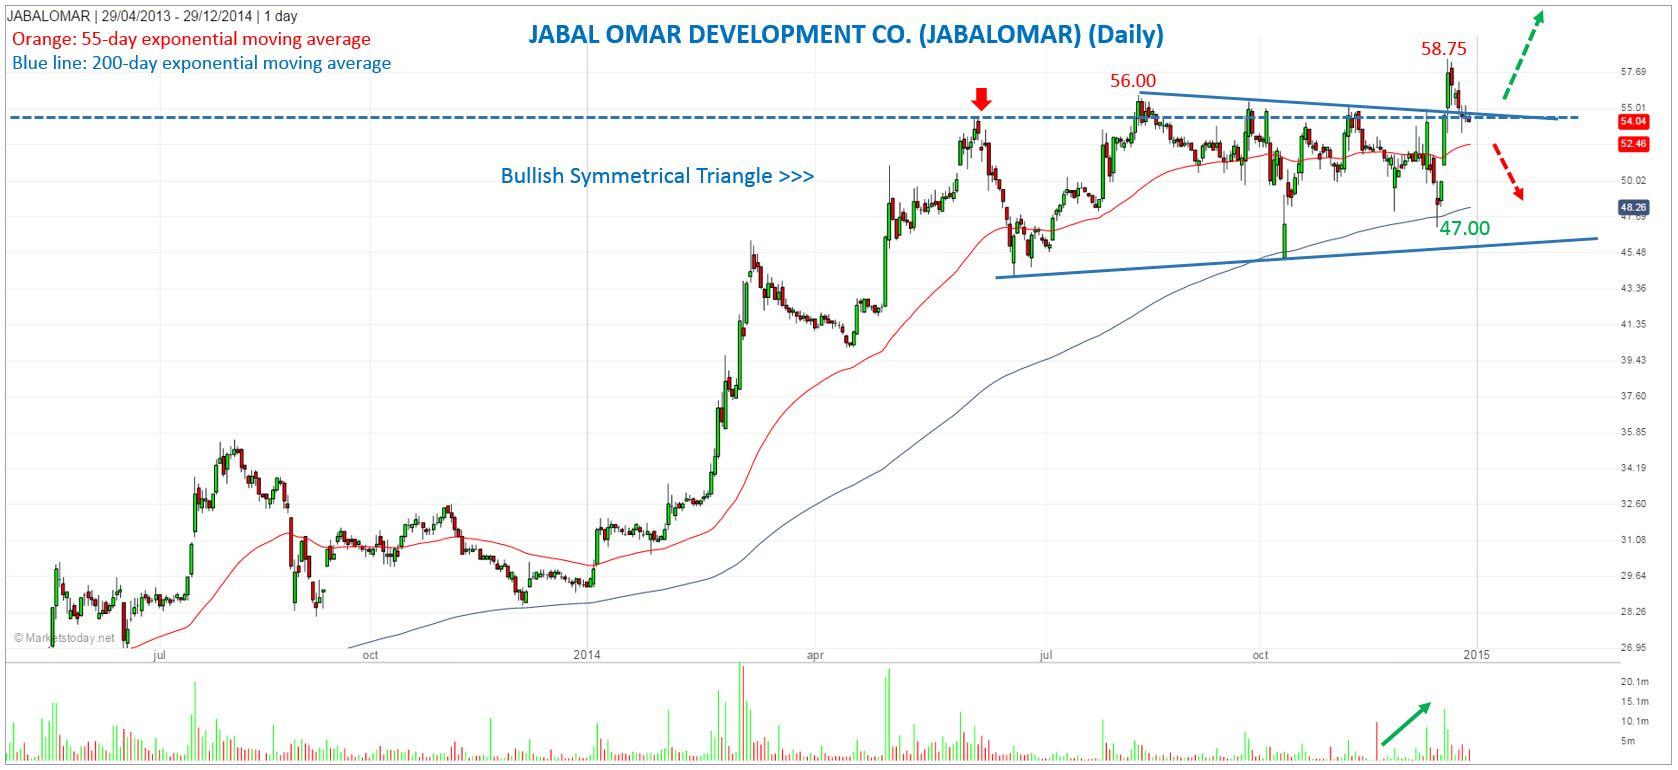 Jabal Omar Development Co  Shows Strength | Investing com